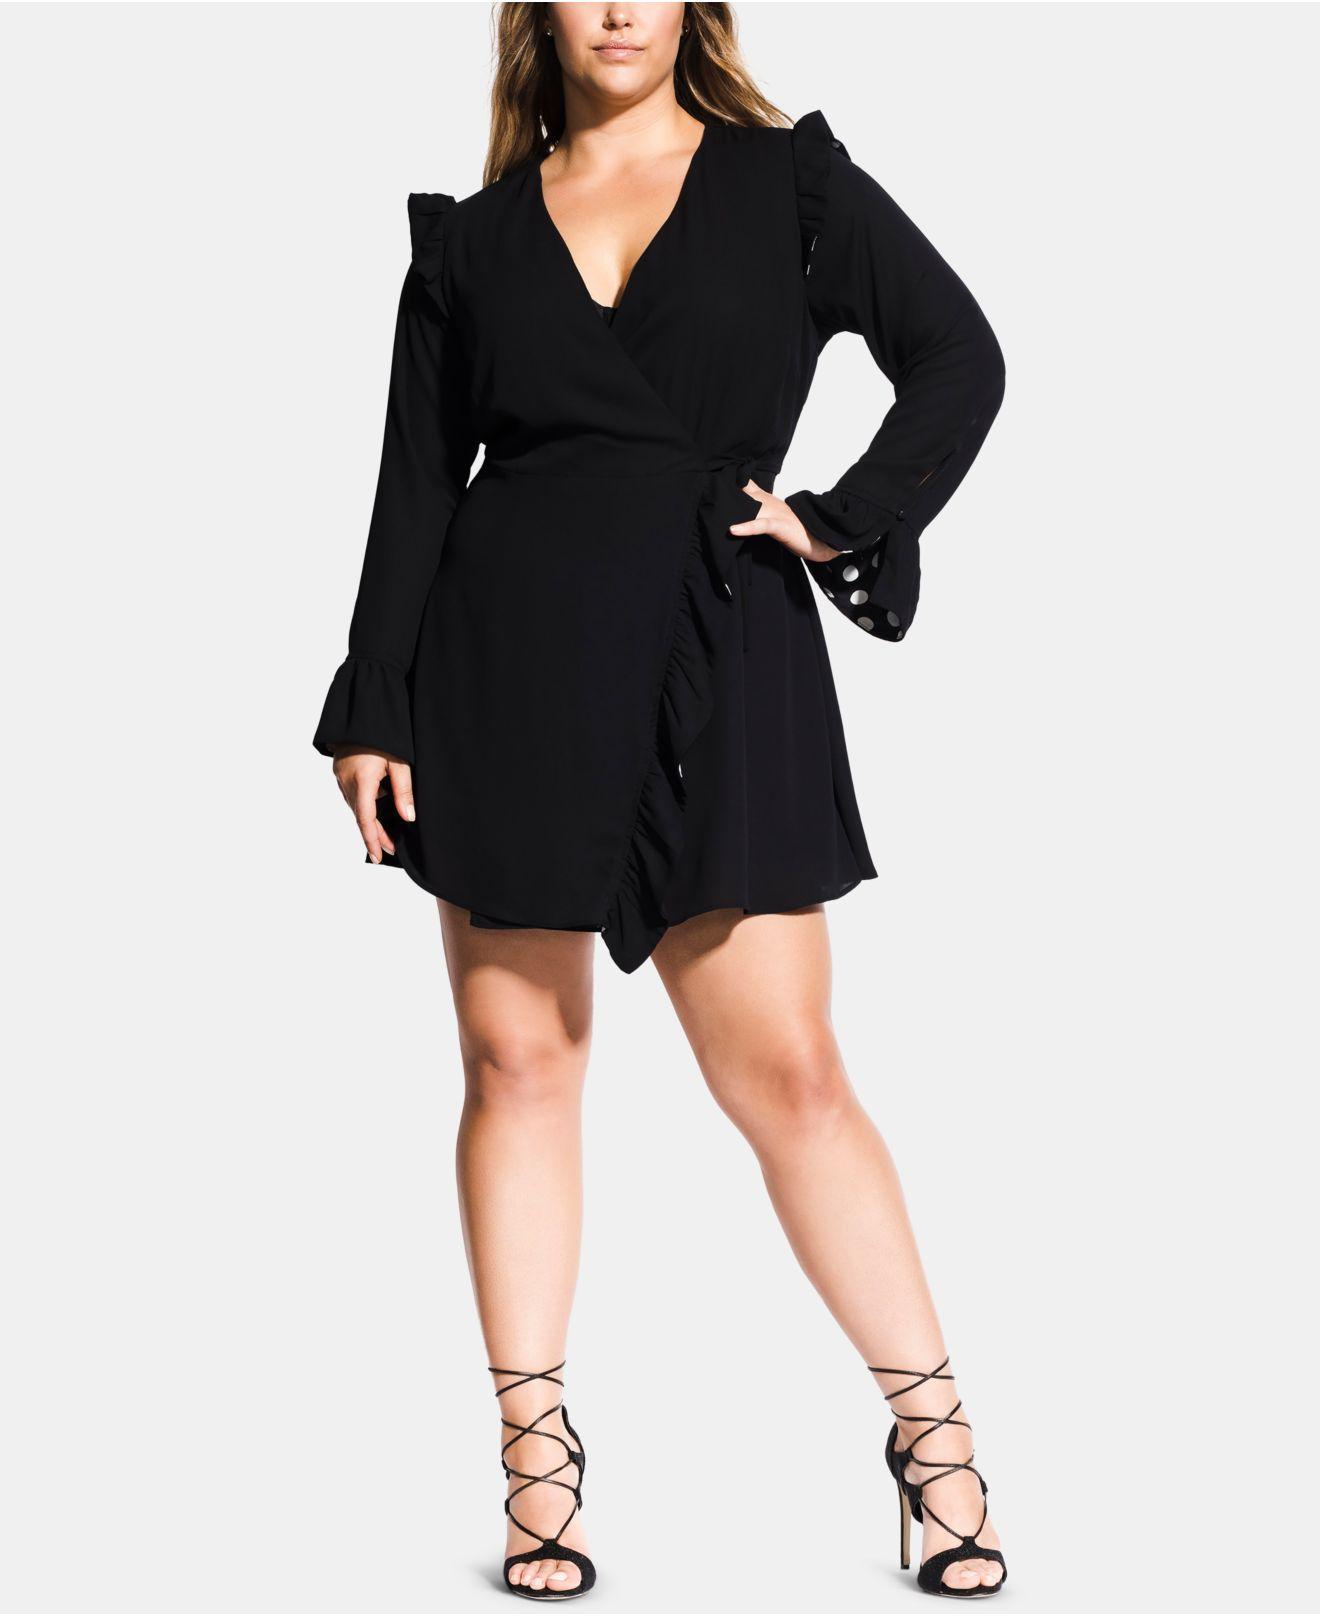 5e6c7e3e8b Lyst - City Chic Trendy Plus Size Catalina Playsuit in Black